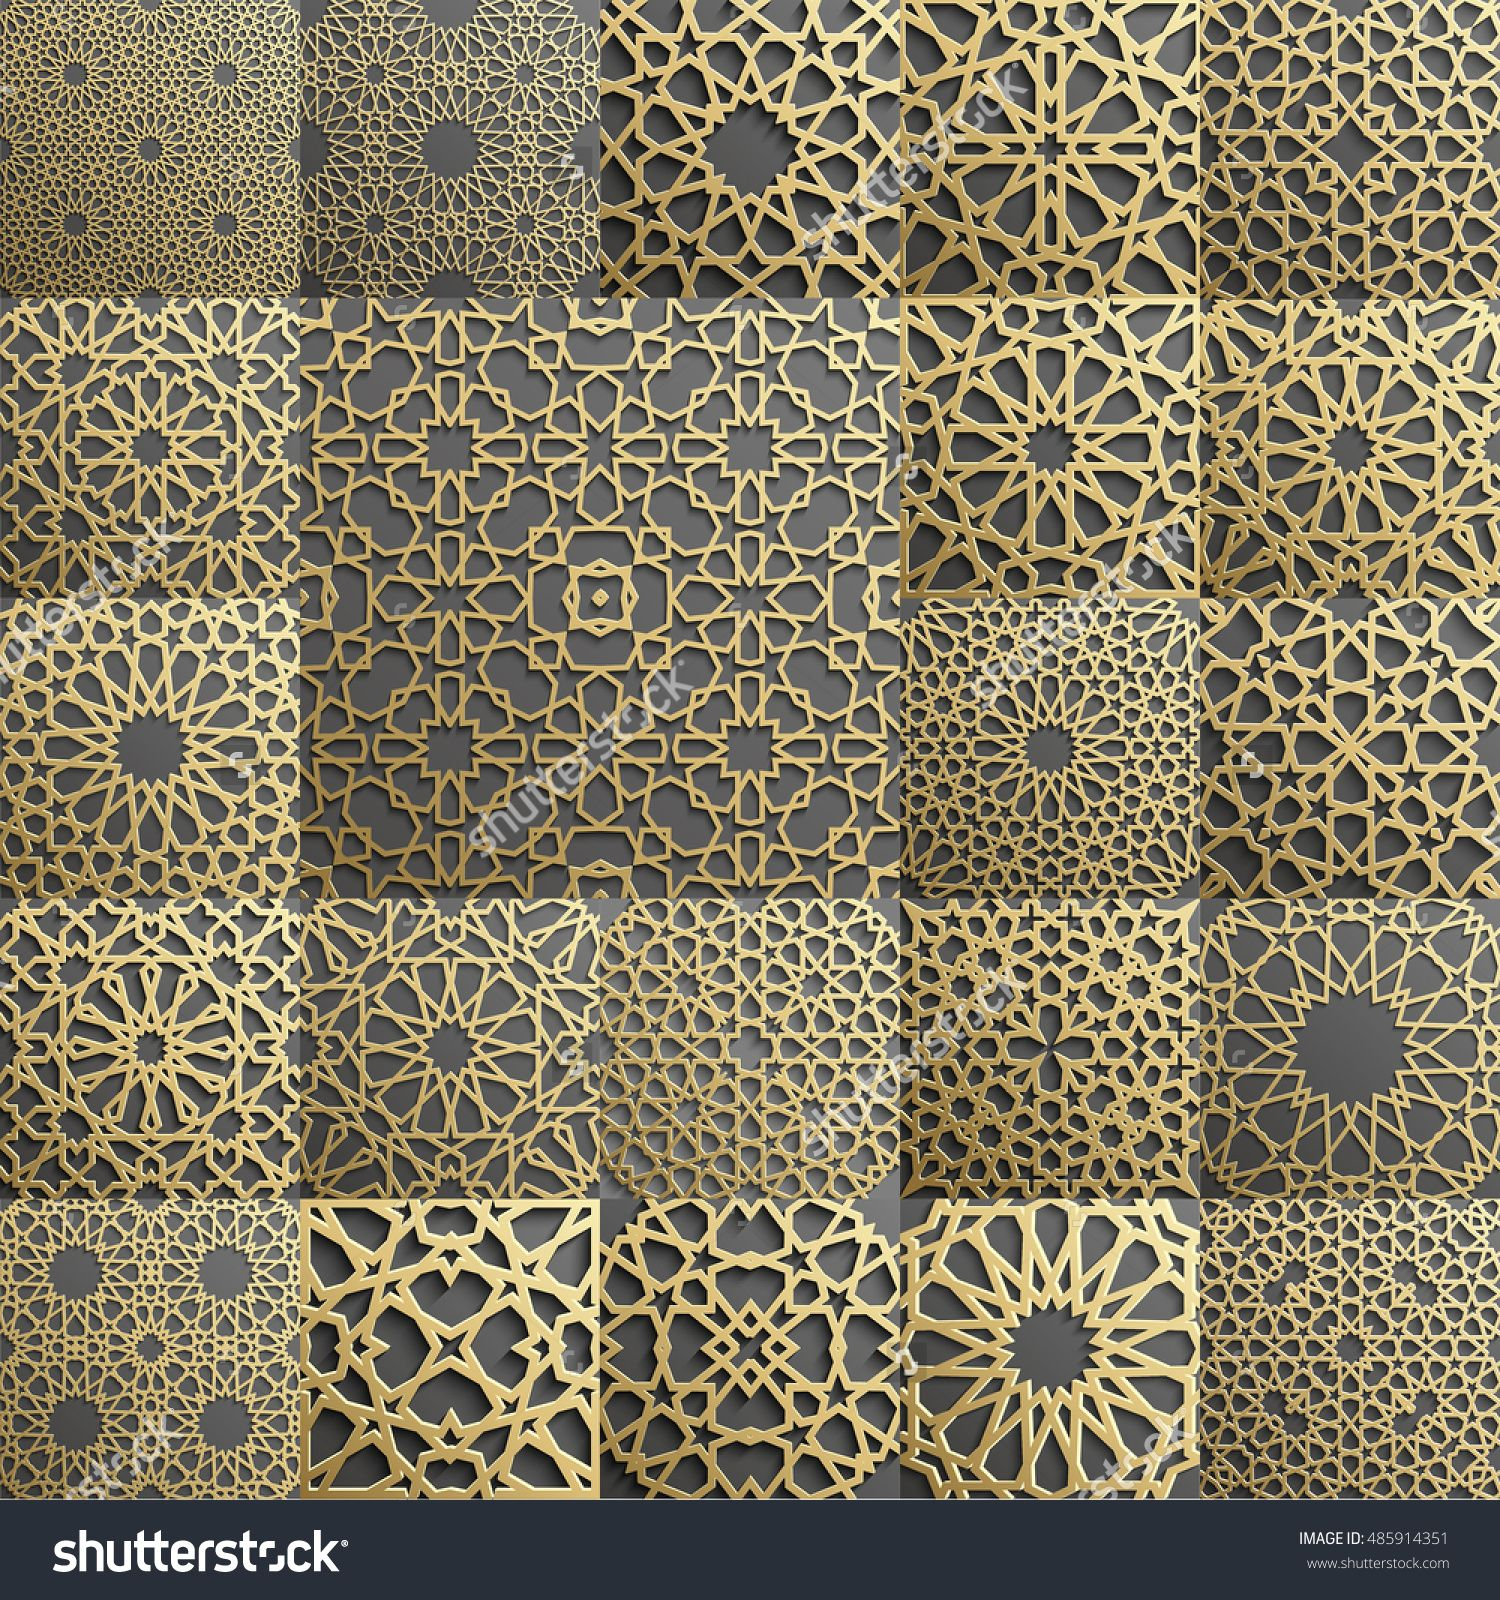 Islamic Pattern Seamless Arabic Geometric Pattern East Ornament - Carved wood lace like lighting design inspired islamic decoration patterns